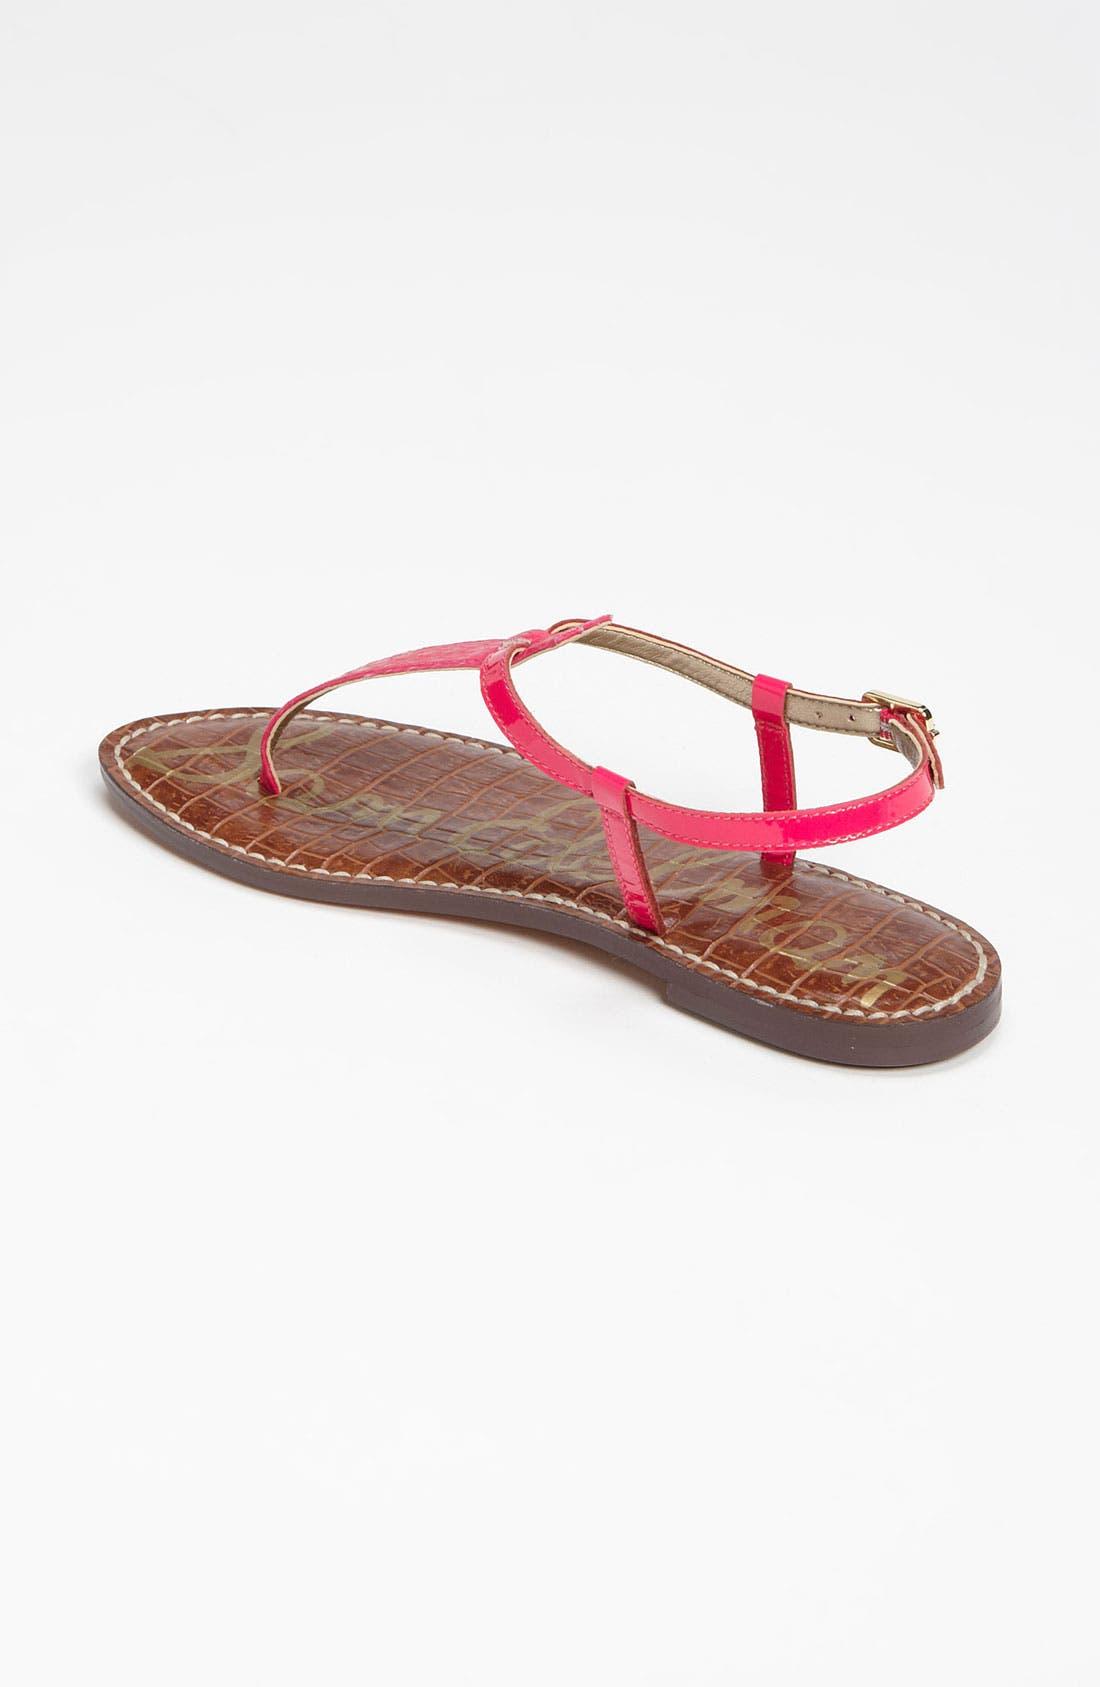 Alternate Image 2  - Sam Edelman 'Gigi' Sandal (Women) (Exclusive Color)